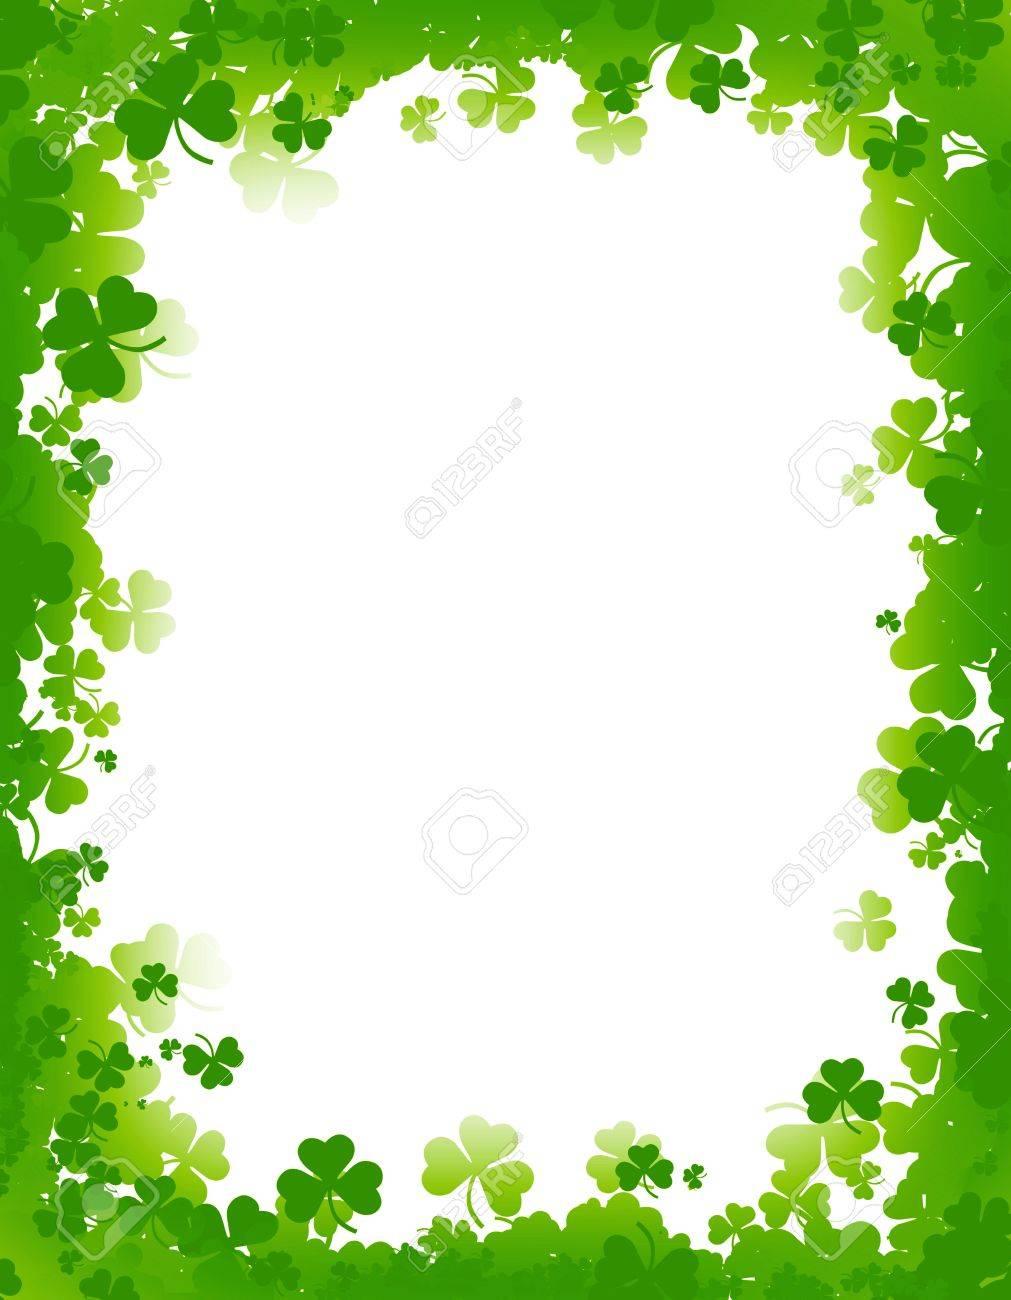 Green clover st. Patrick's Day Background / Border.